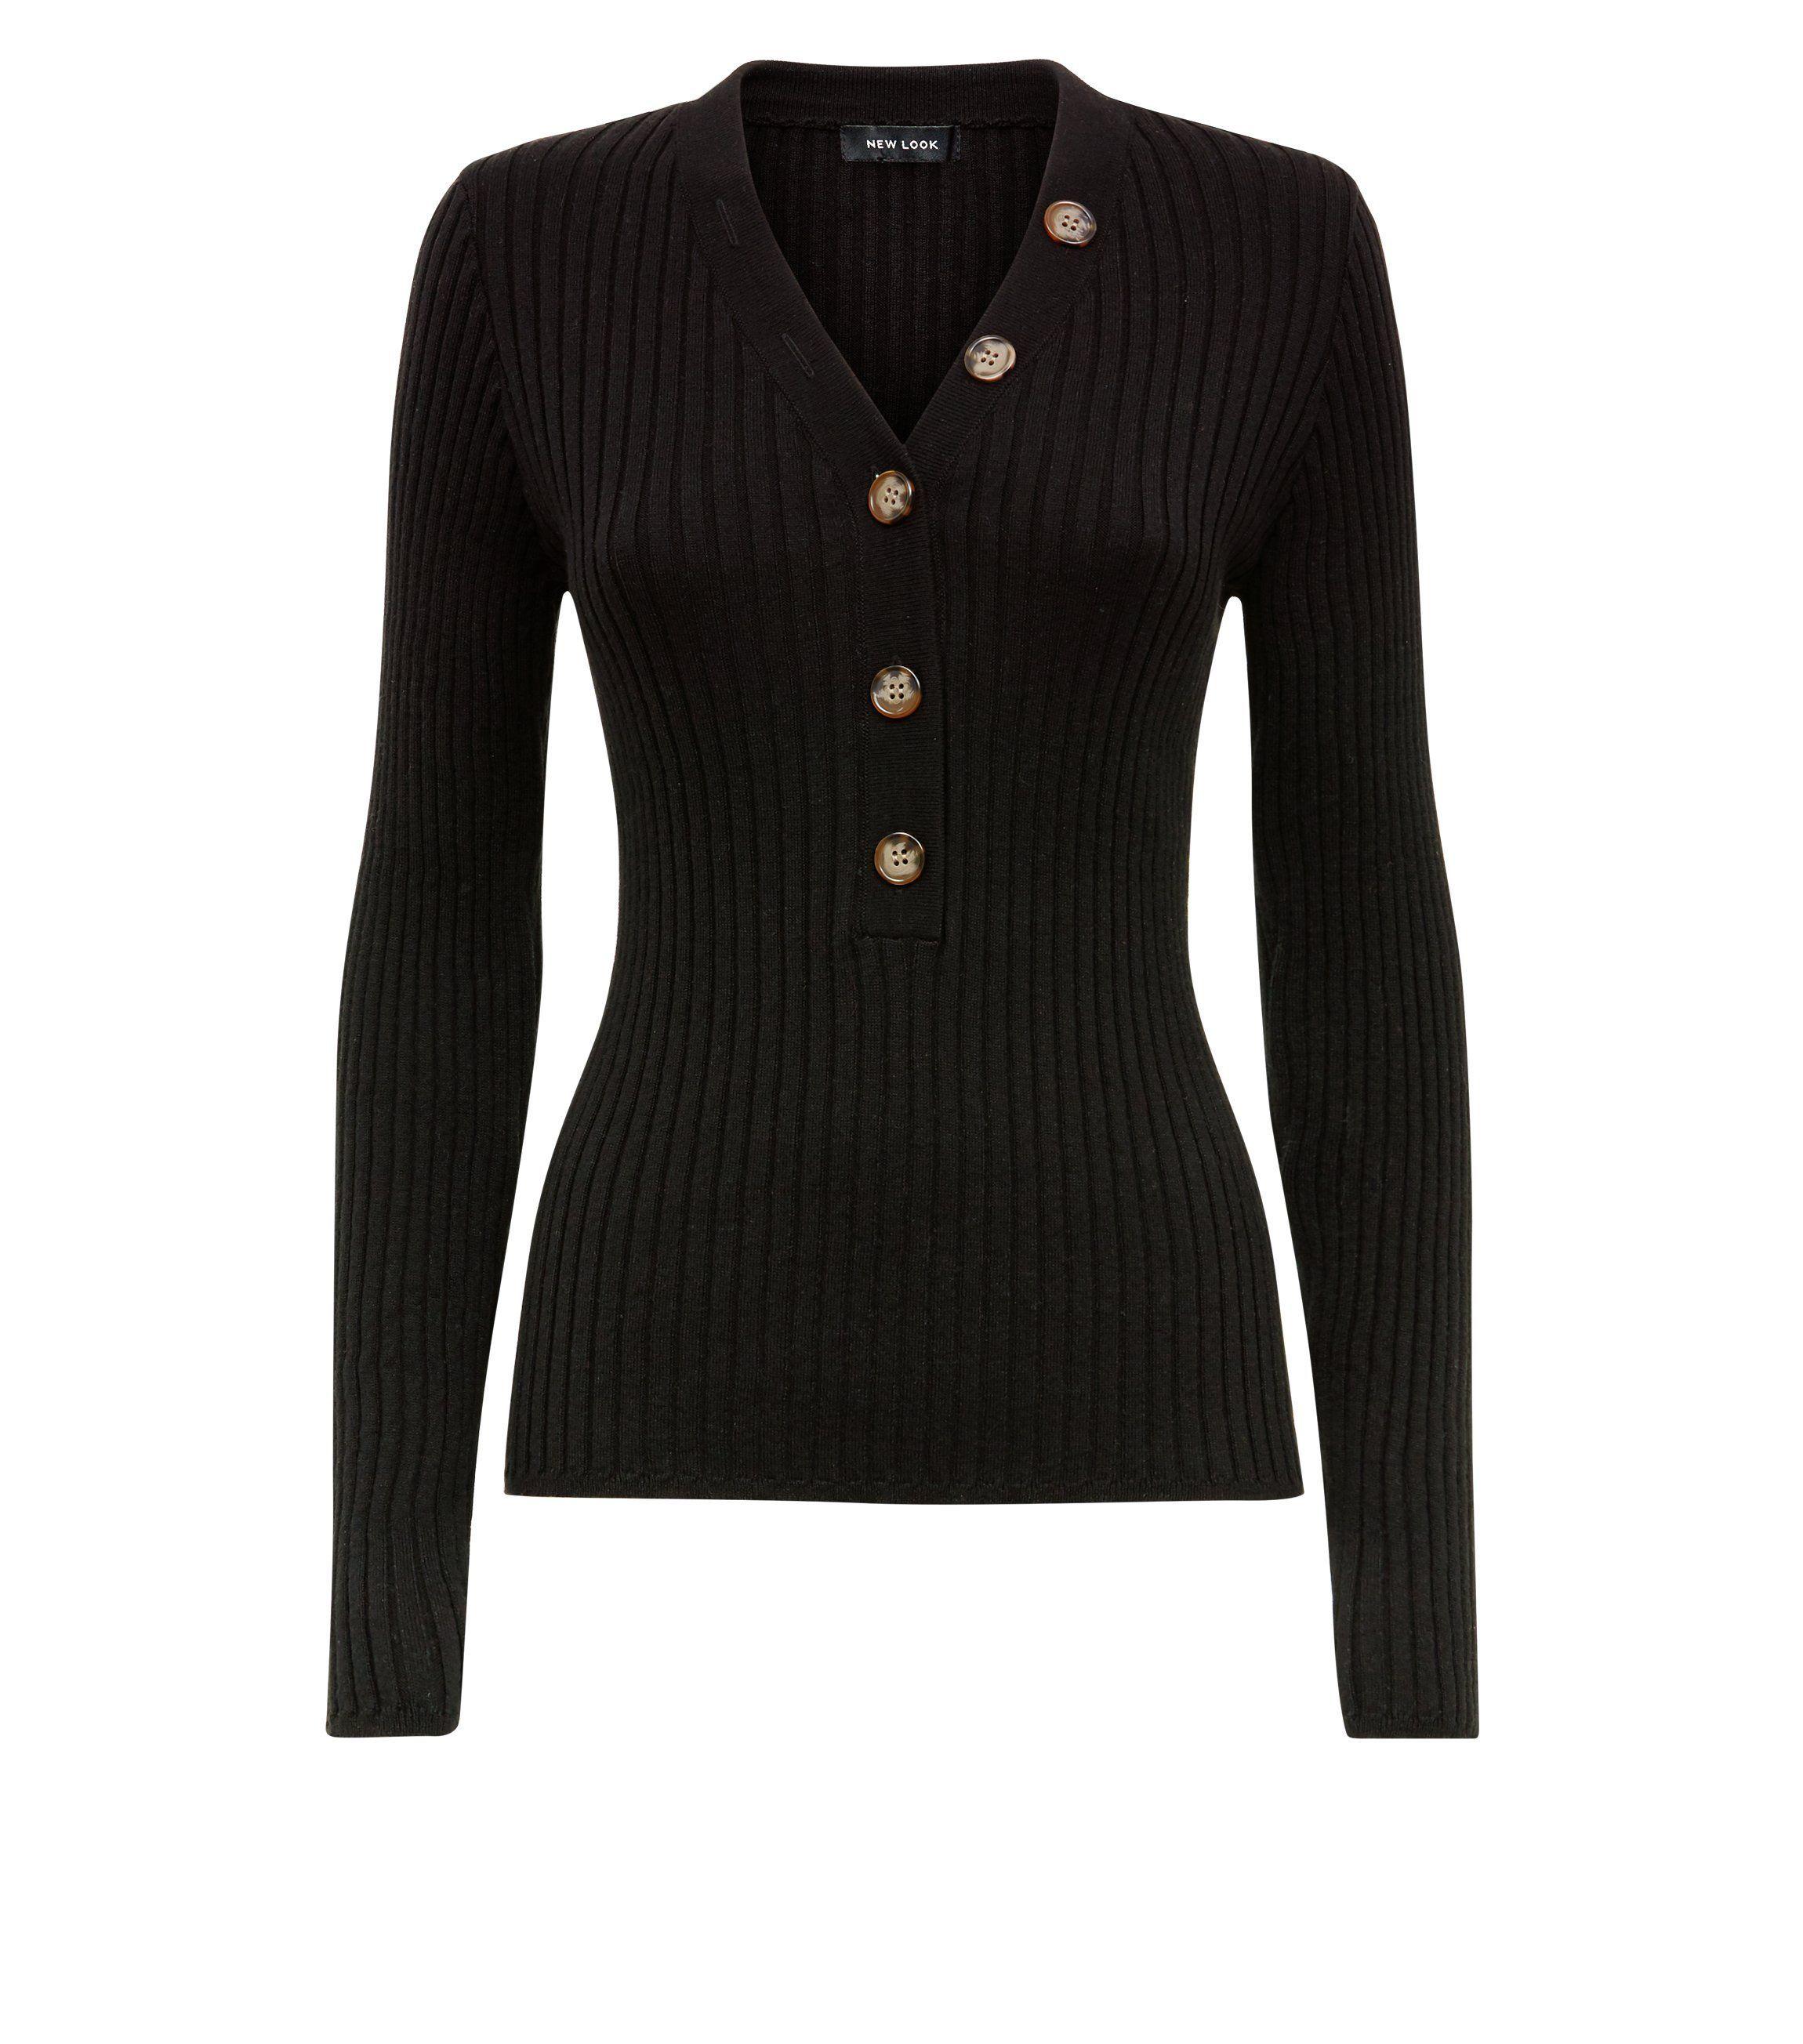 Black ribbed button trim jumper womenus fashion that i love